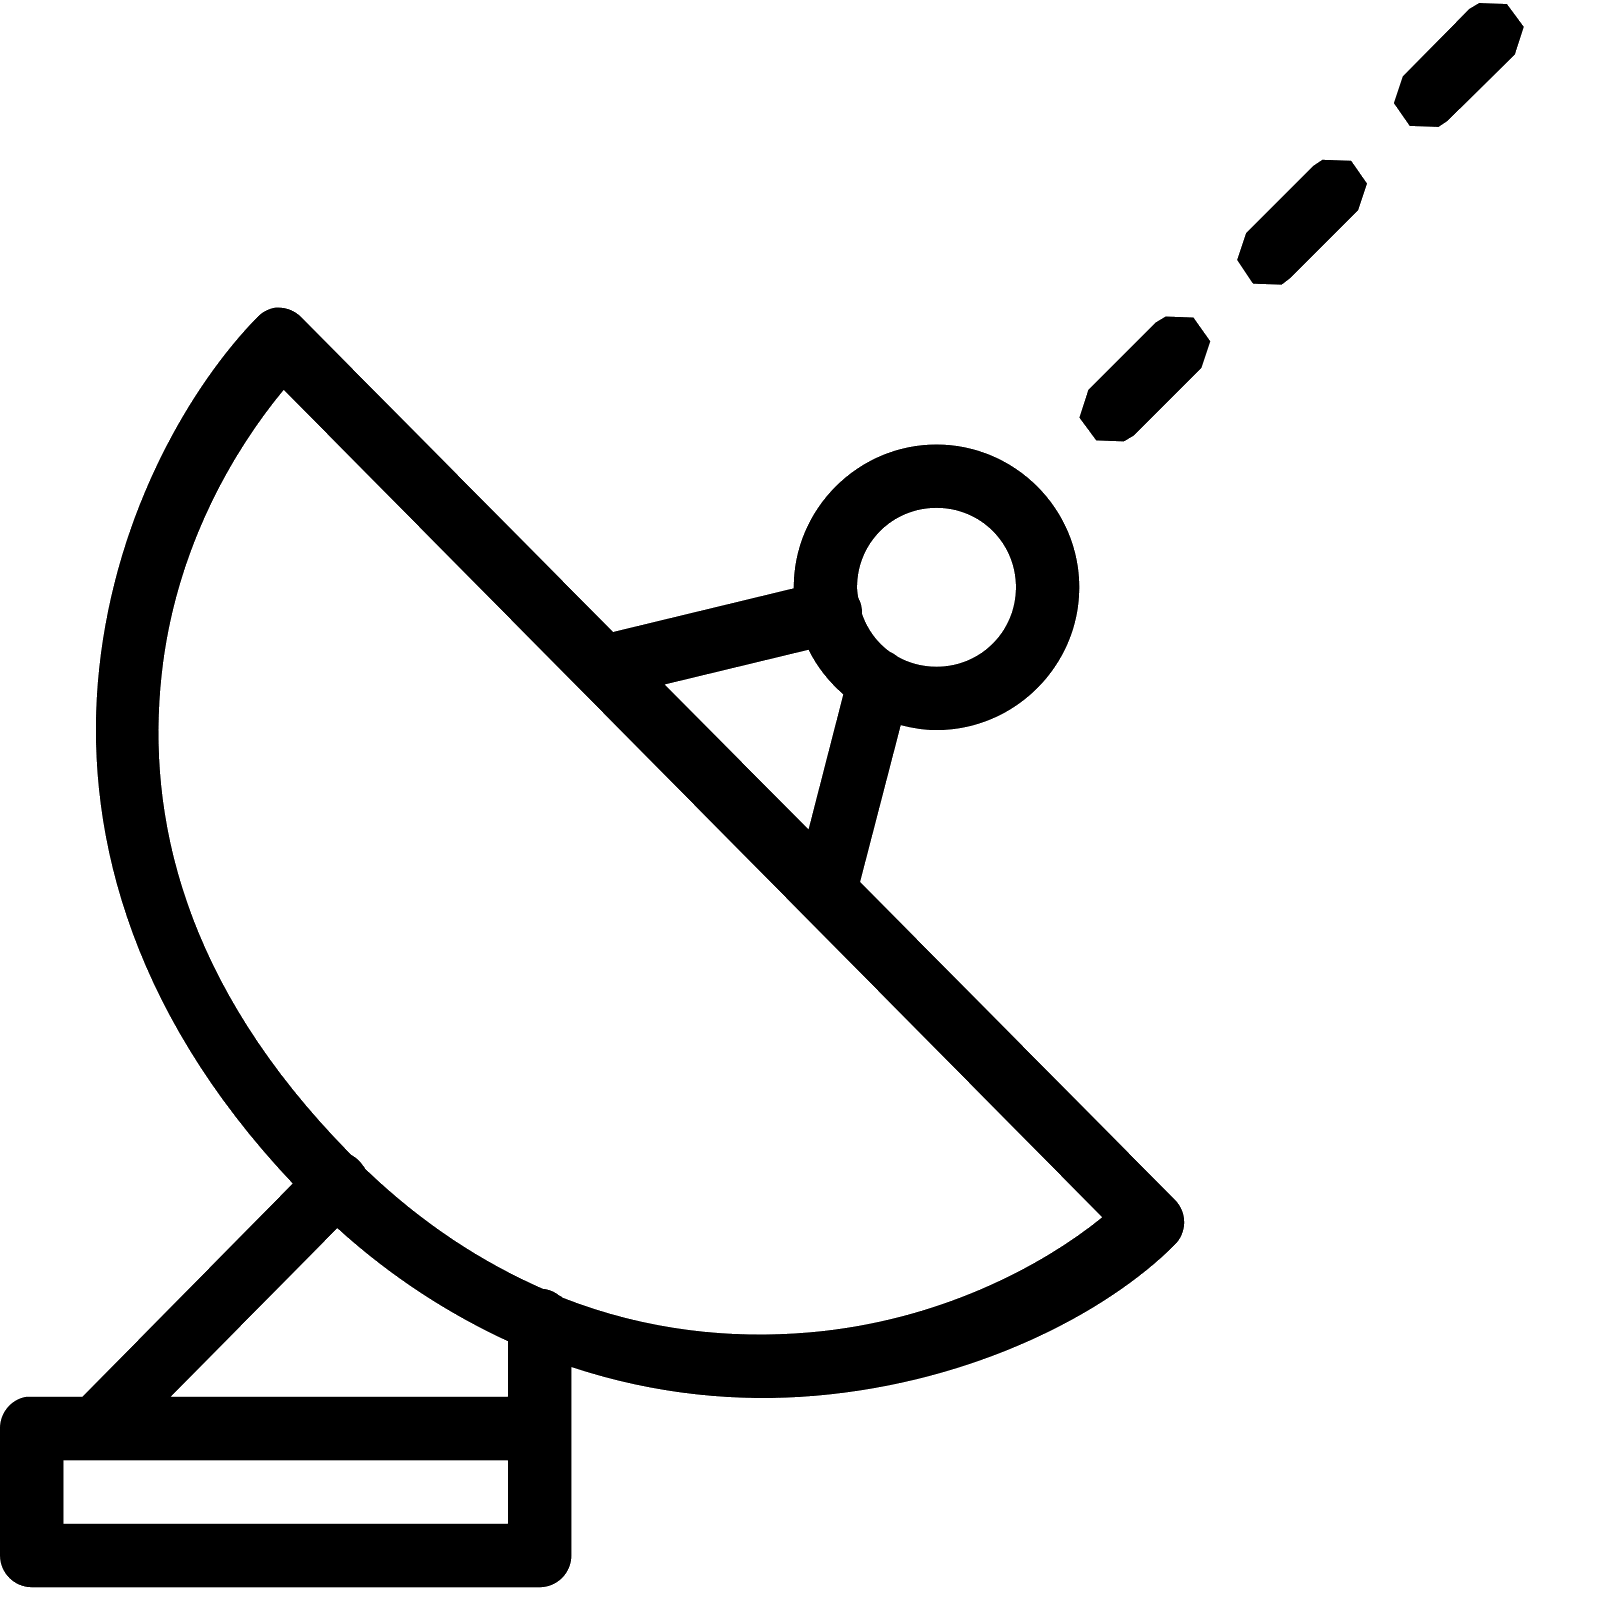 Antenna icon kostenloser download. Gps clipart satellite signal